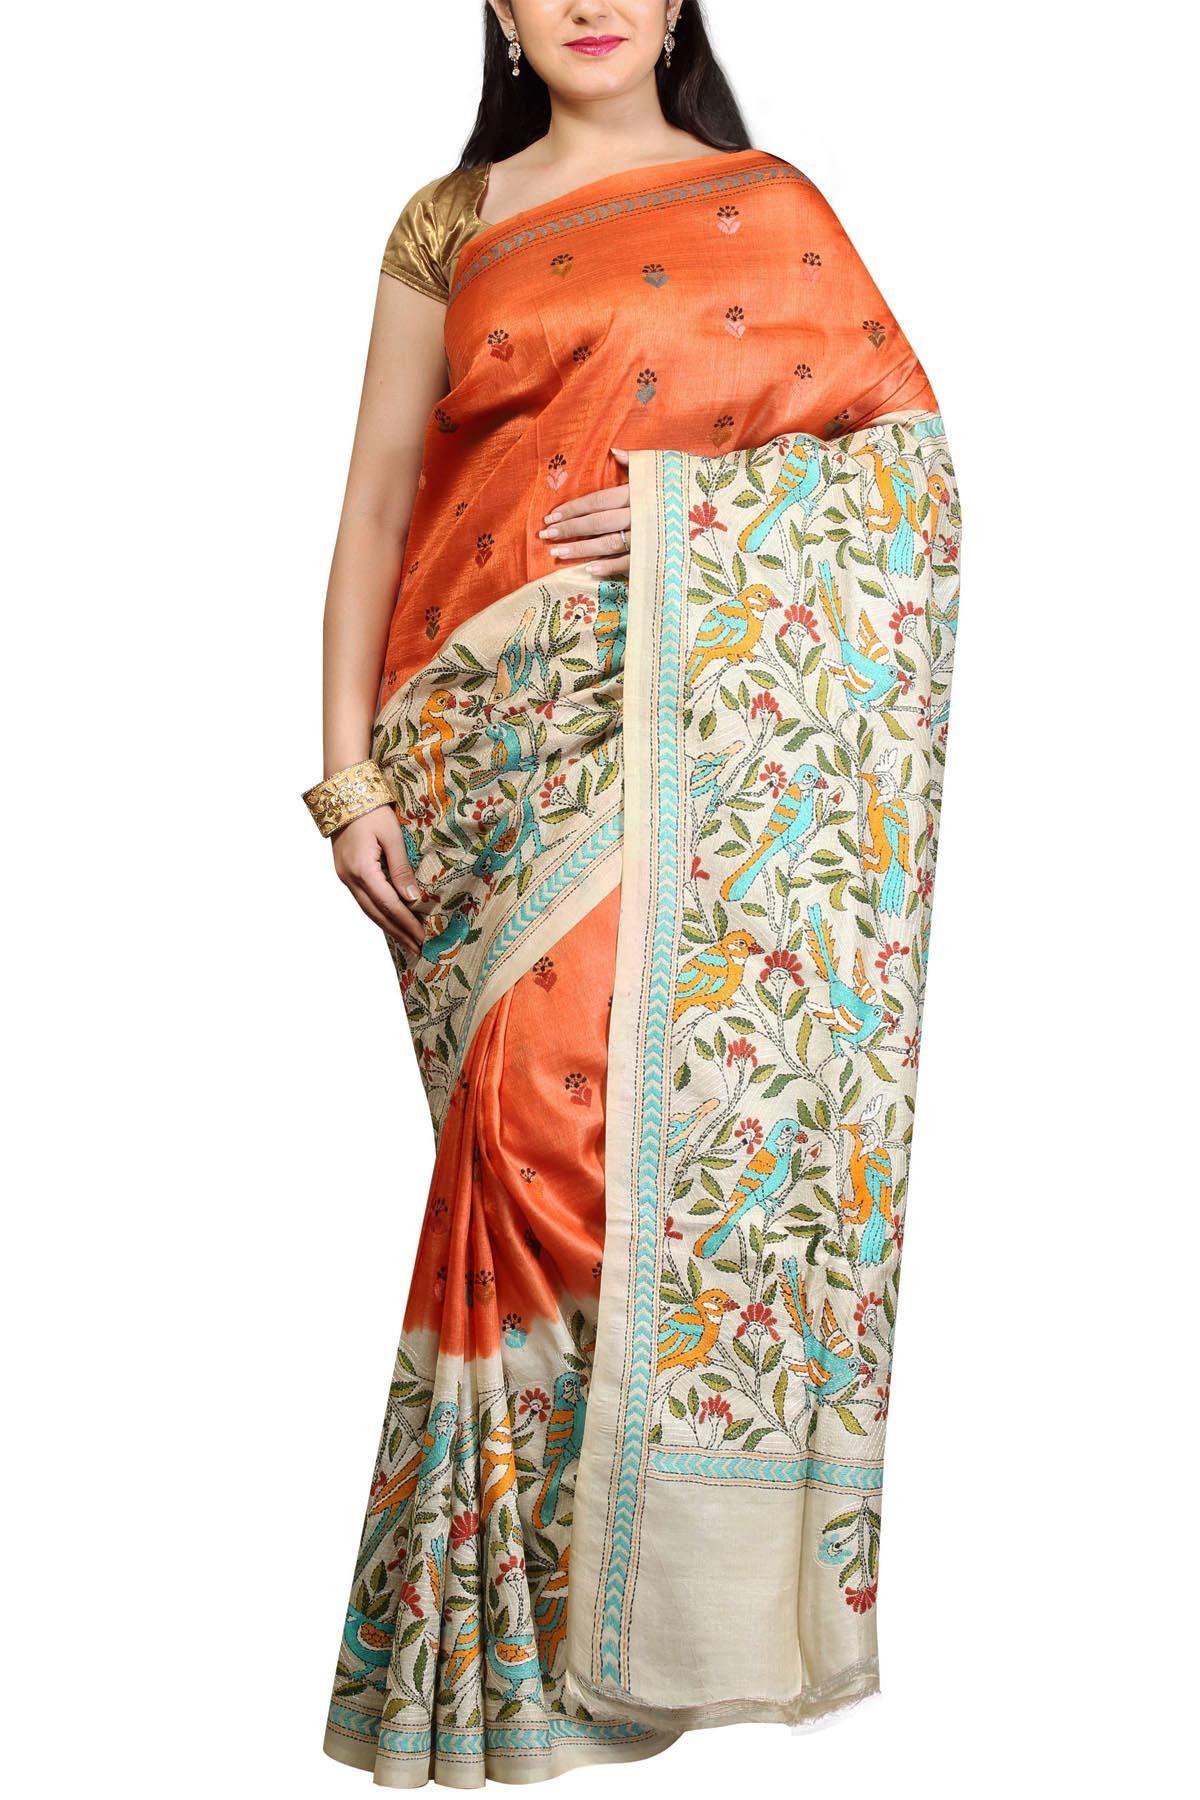 chandra bhaga stripe patterned baluchari silksaree baluchari beige rust nakshi kantha tussar silk saree